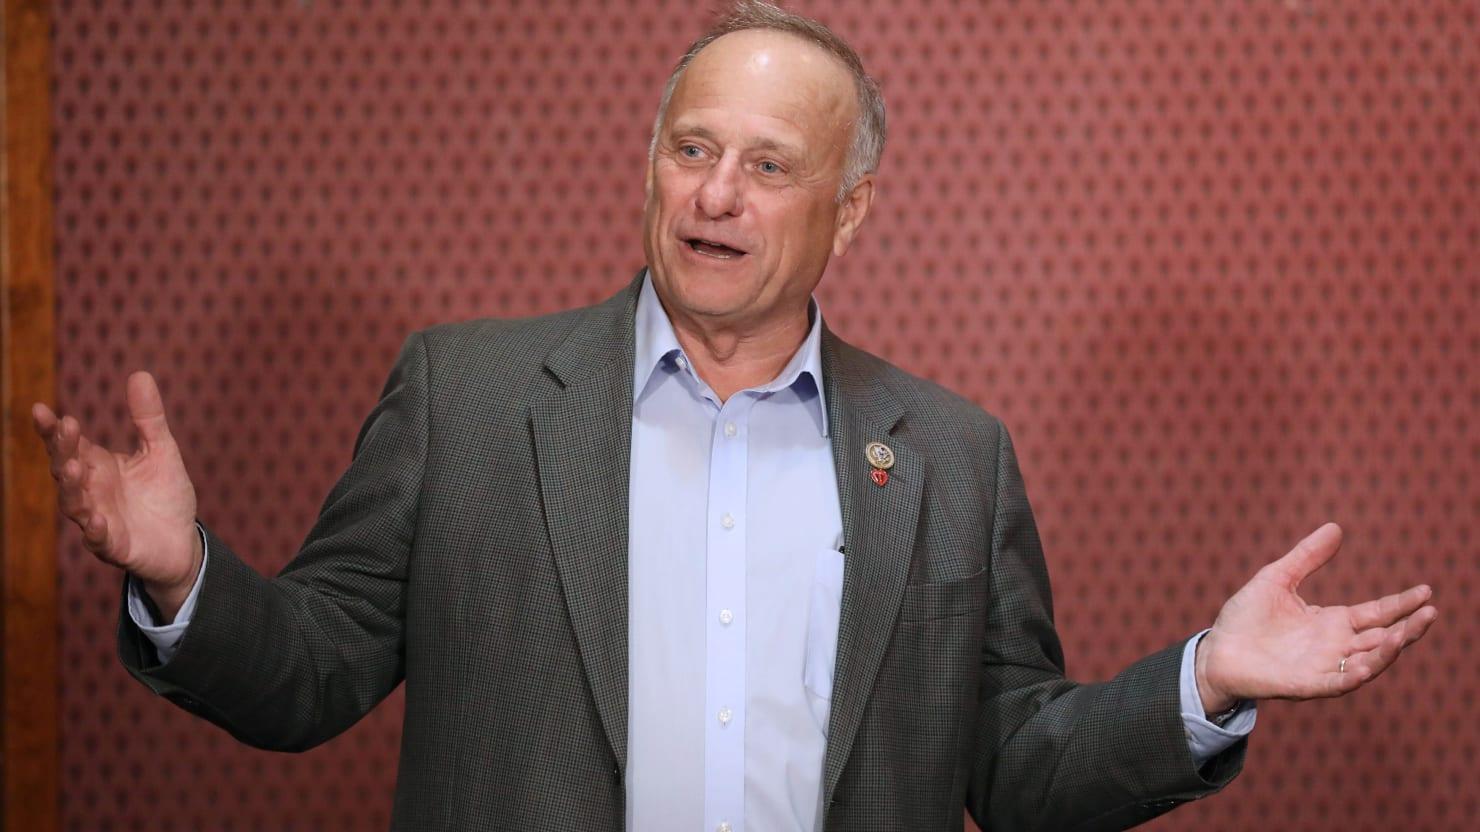 Rep. Steve King Slams GOP for Not Discriminating Against Gay Candidates